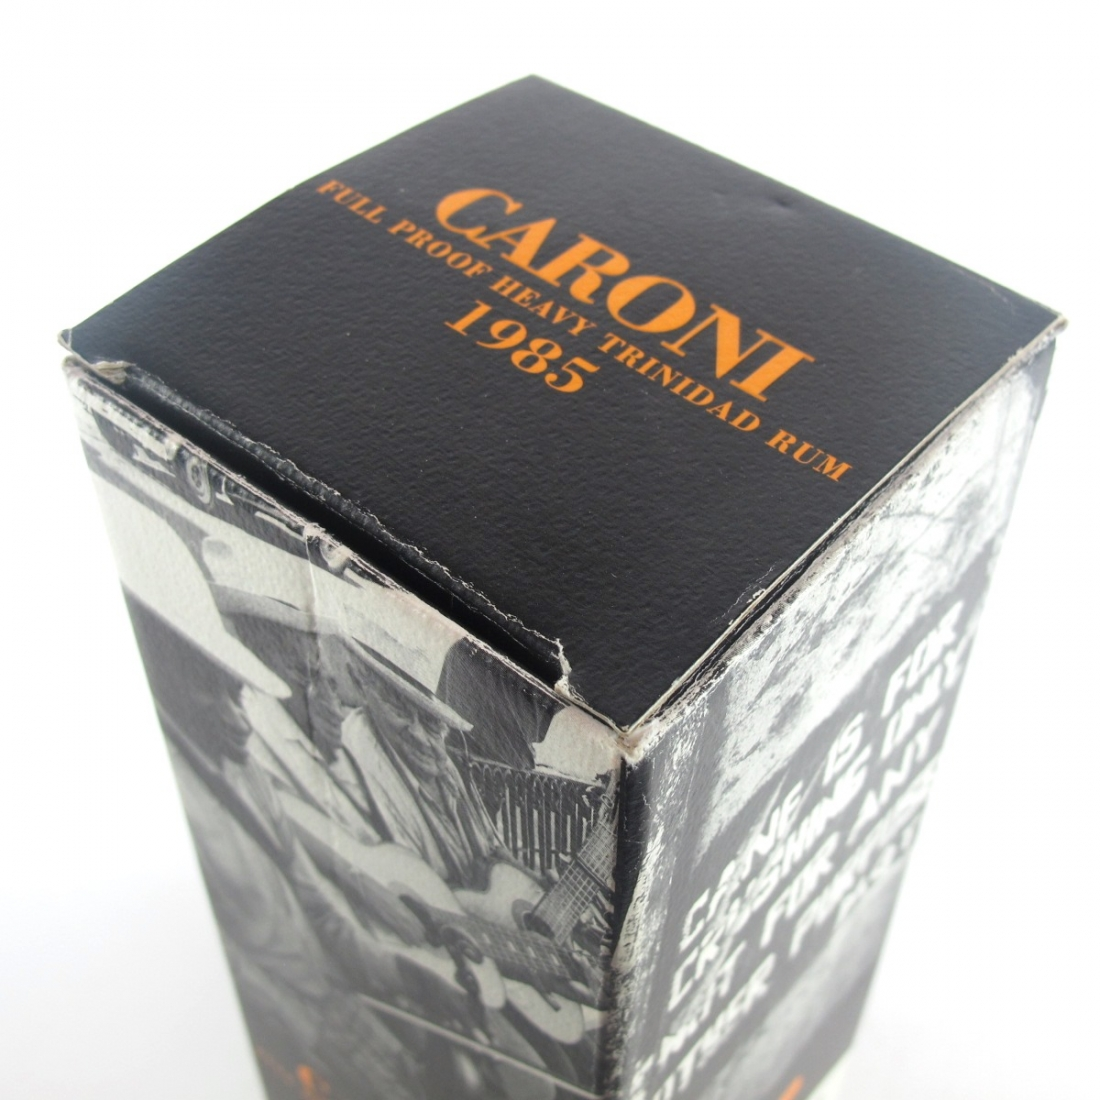 Caroni 1985 Full Proof 21 Year Old Rum